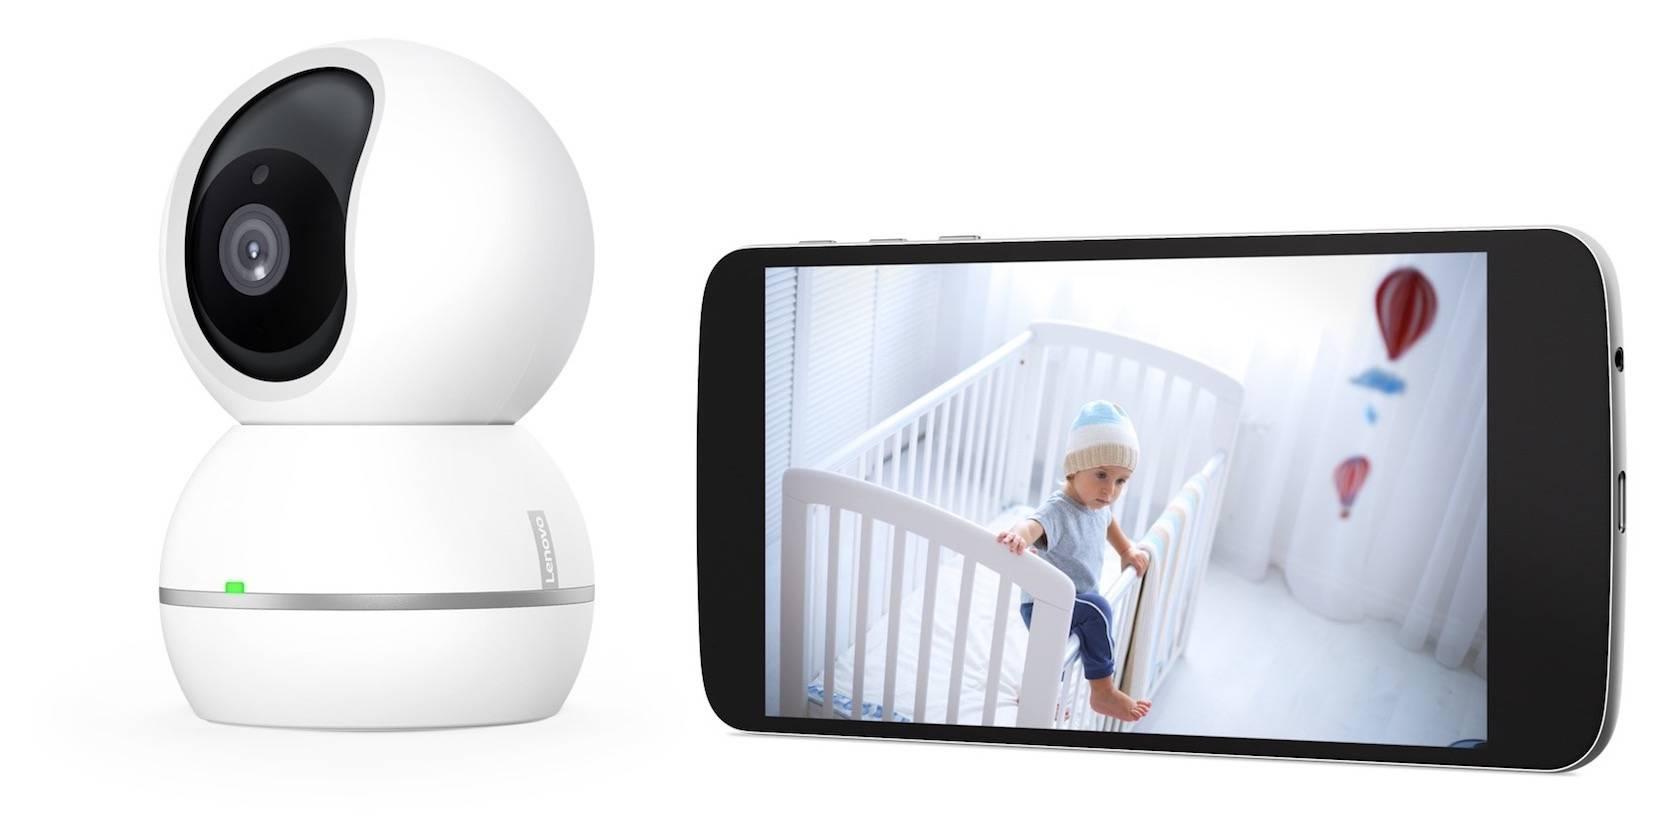 Lenovo Smart Camera Phone